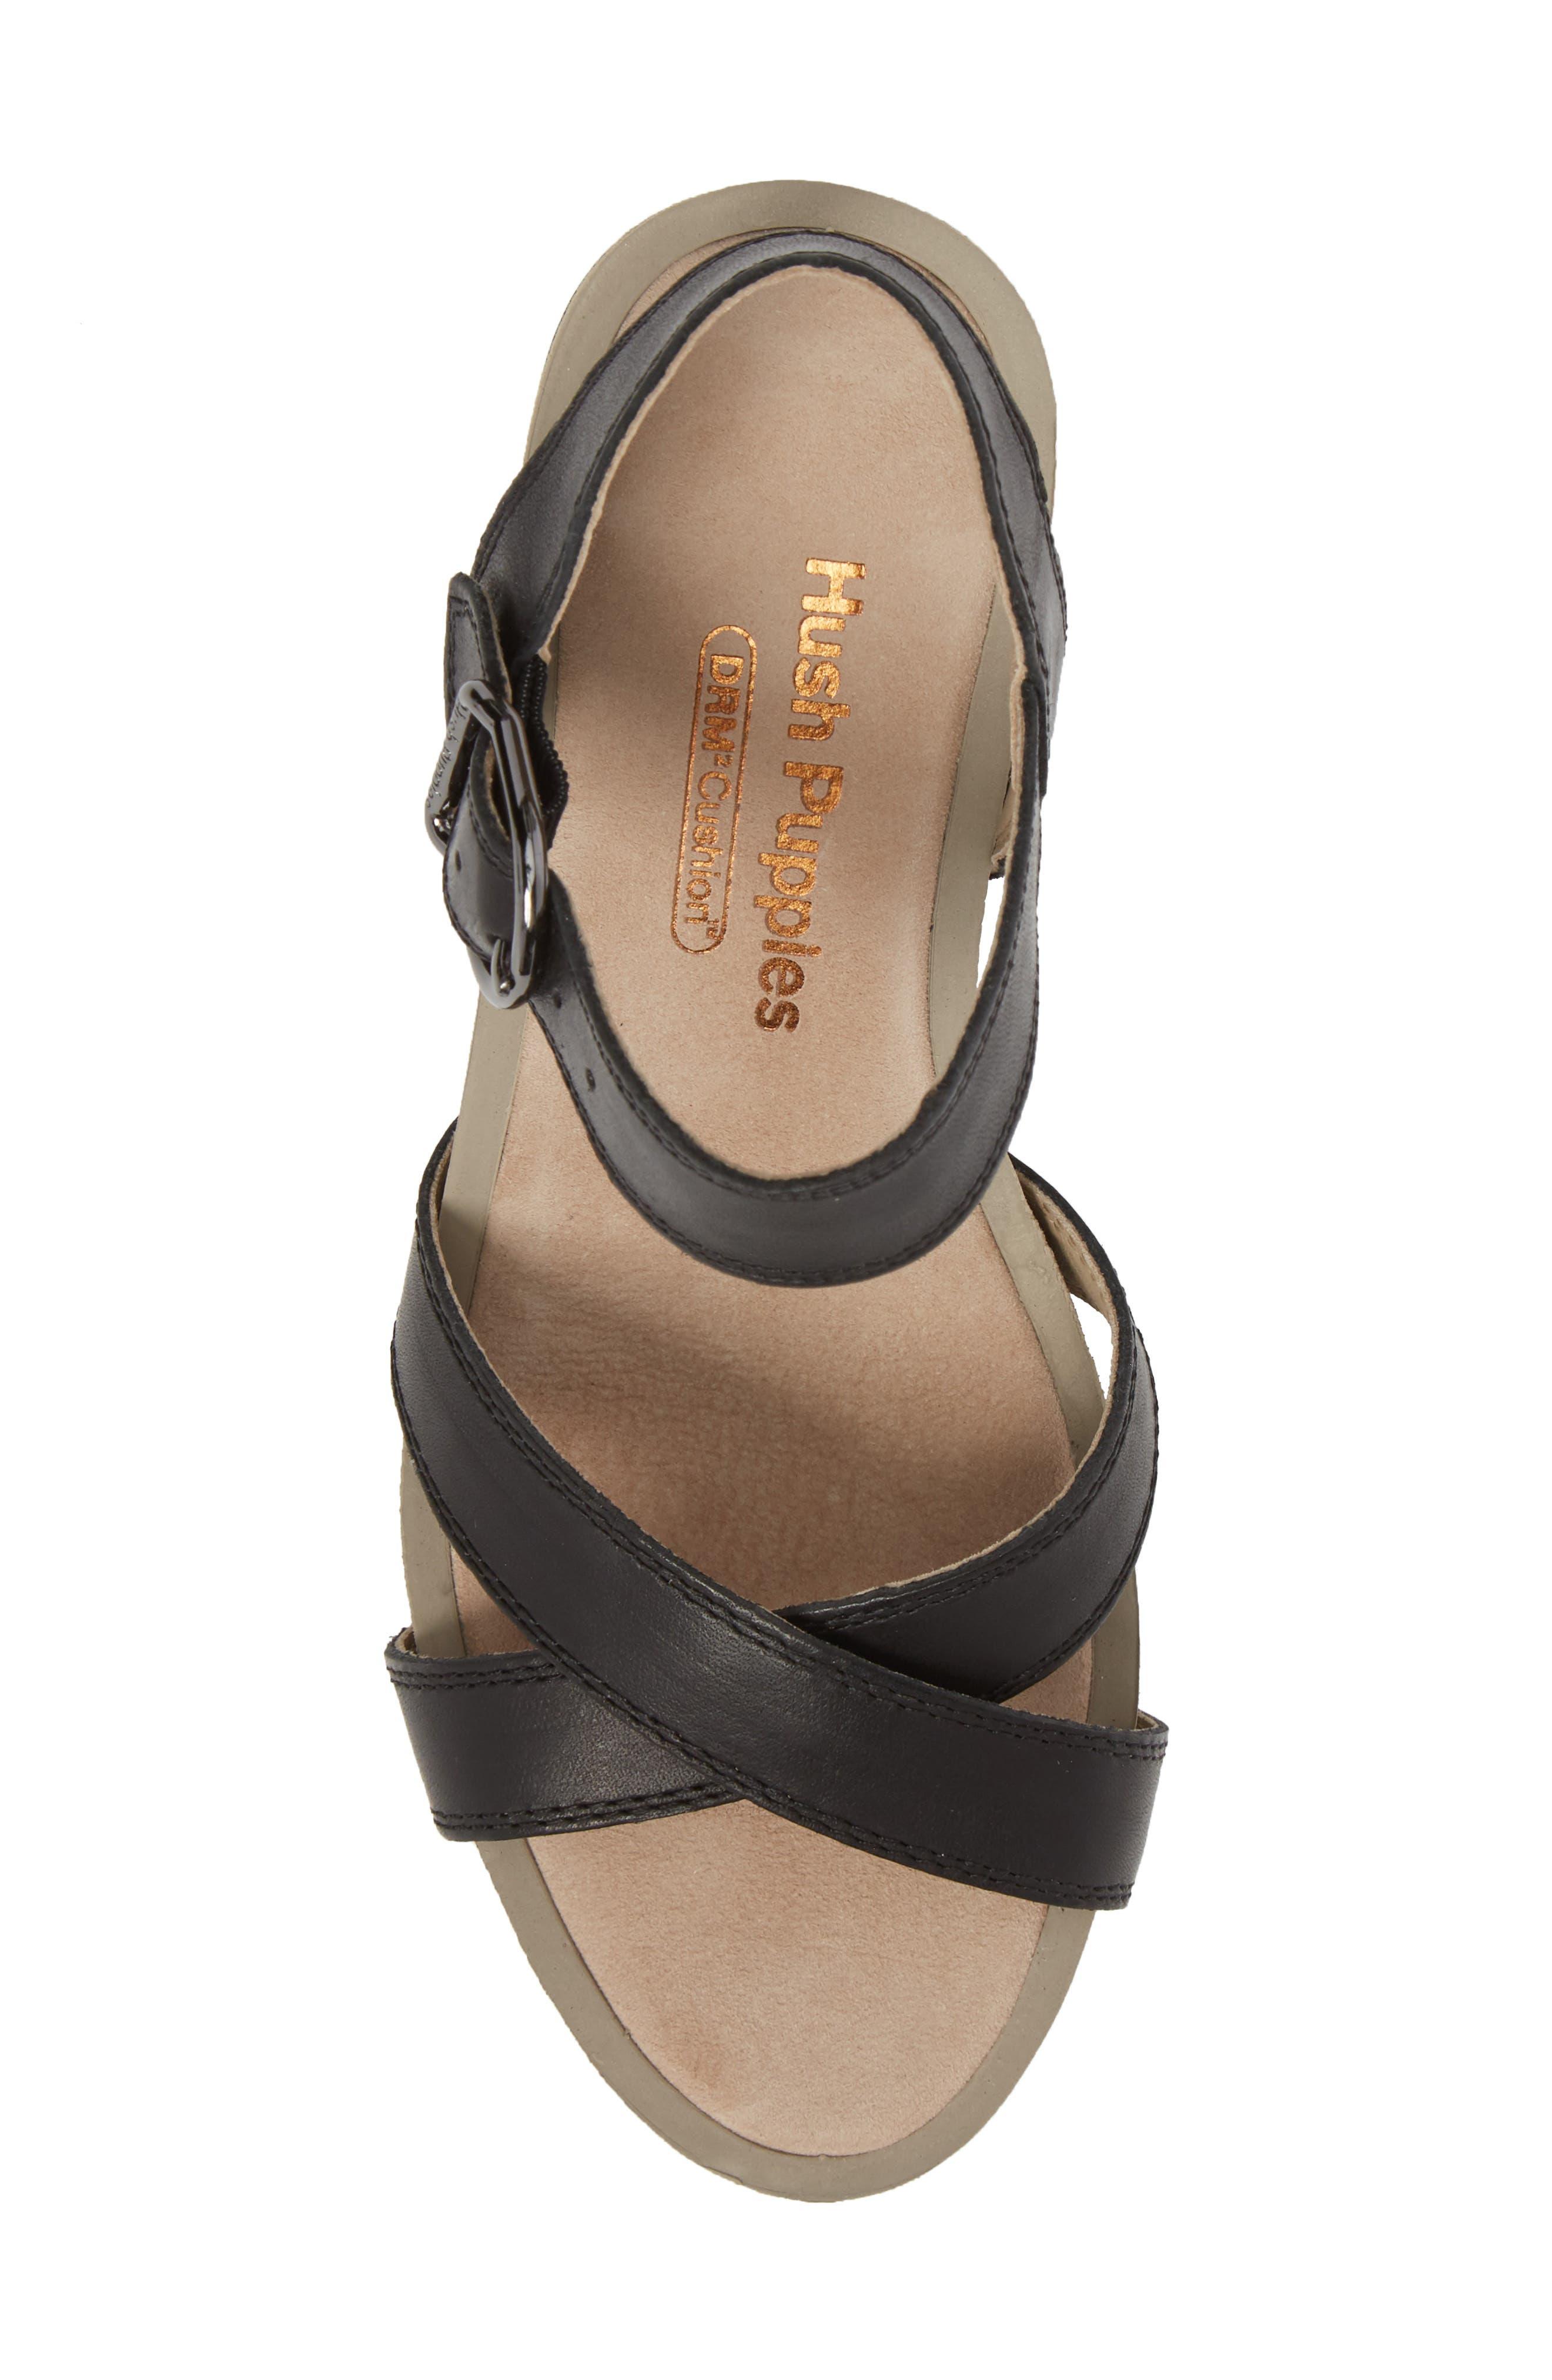 Mariska Block Heel Sandal,                             Alternate thumbnail 5, color,                             Black Leather